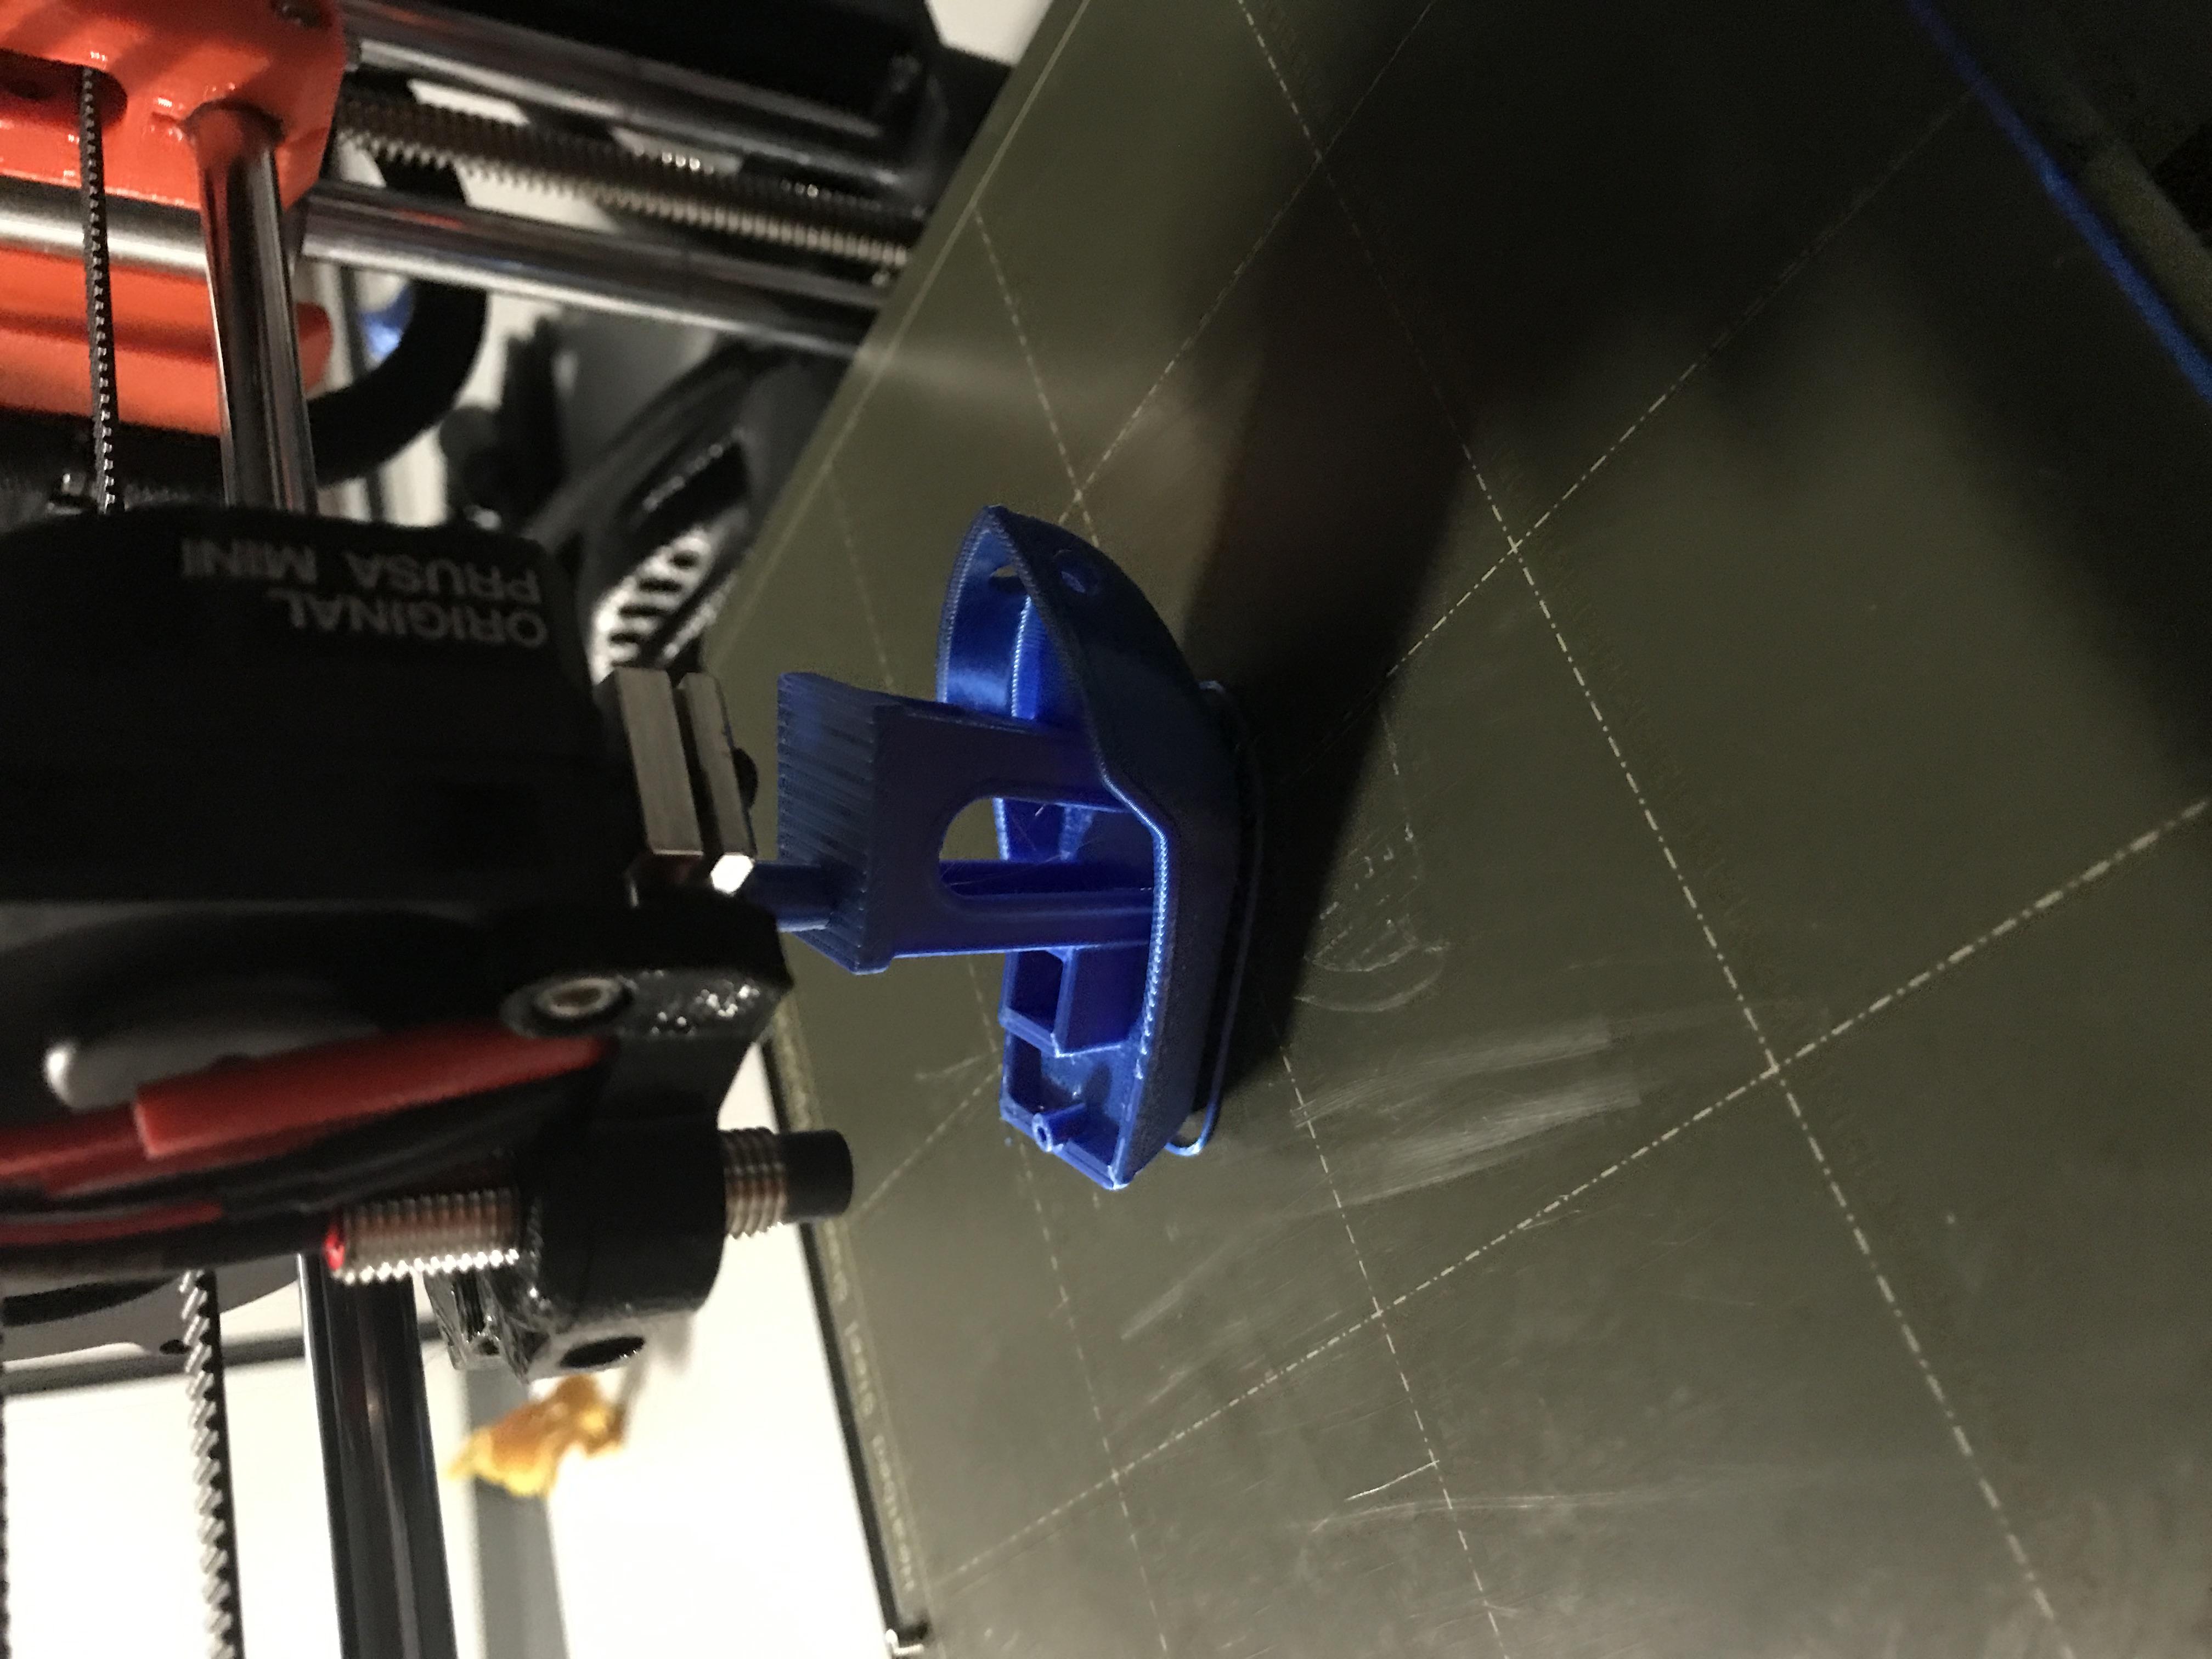 3D print in progress